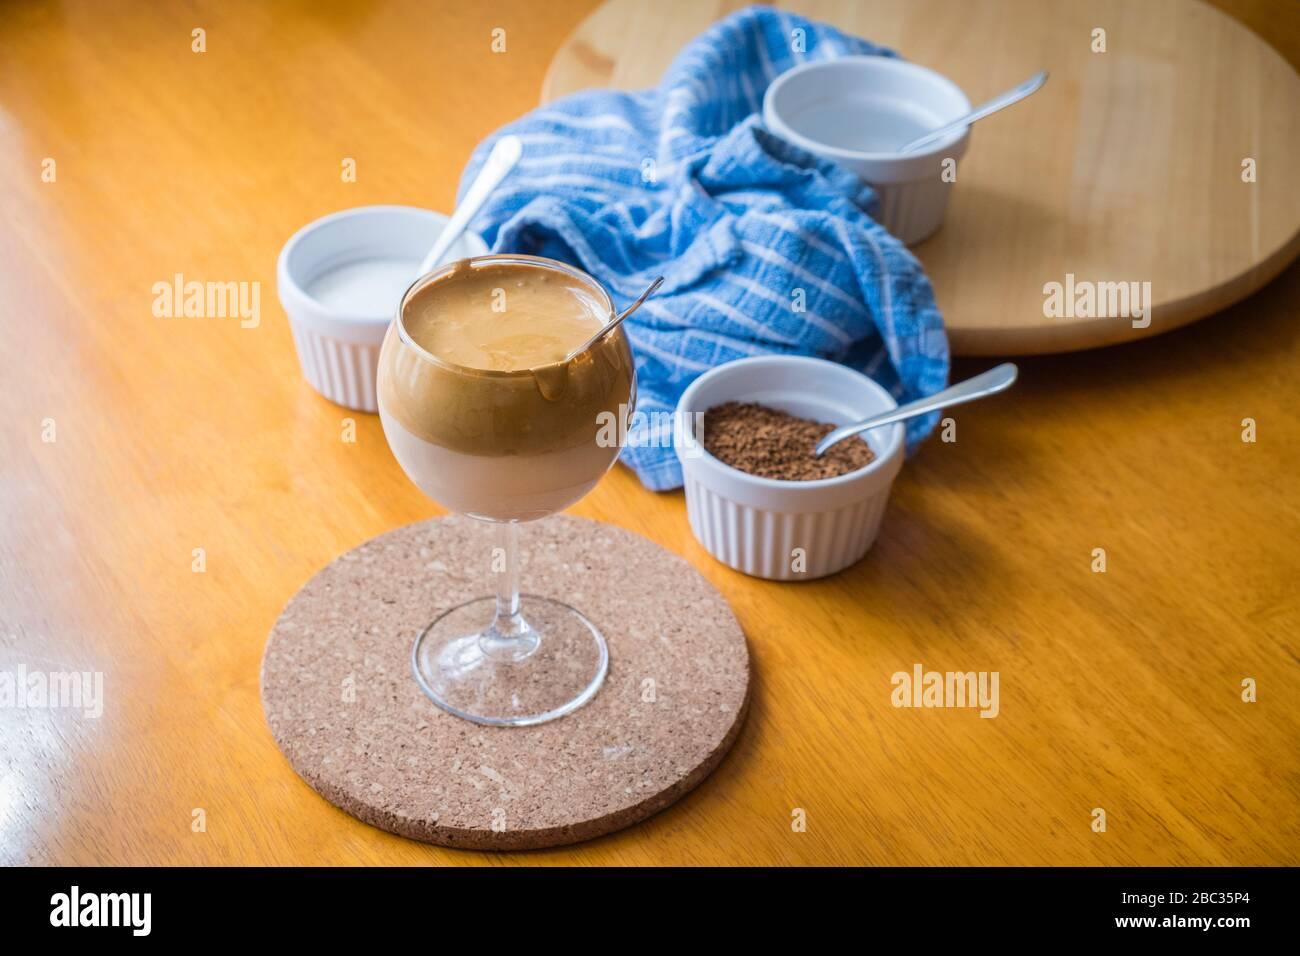 Dalgona Coffee, TikTok trending drink, with ingredients - coffee, sugar and water. Stock Photo